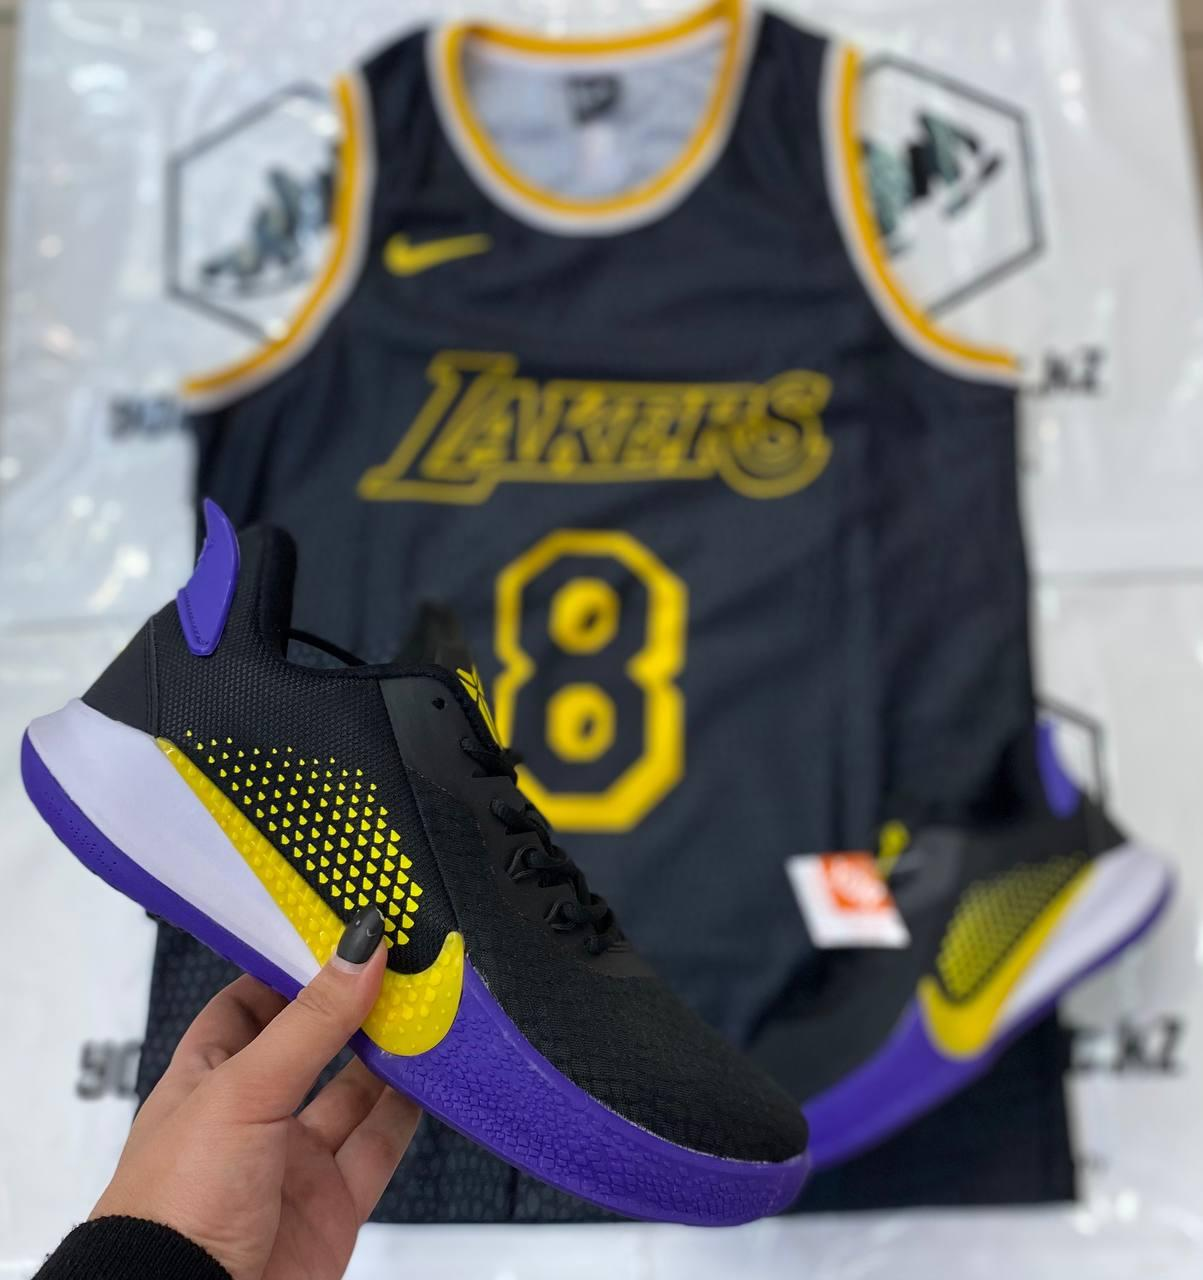 Баскетбольные кроссовки Nike Kobe Mamba Fury